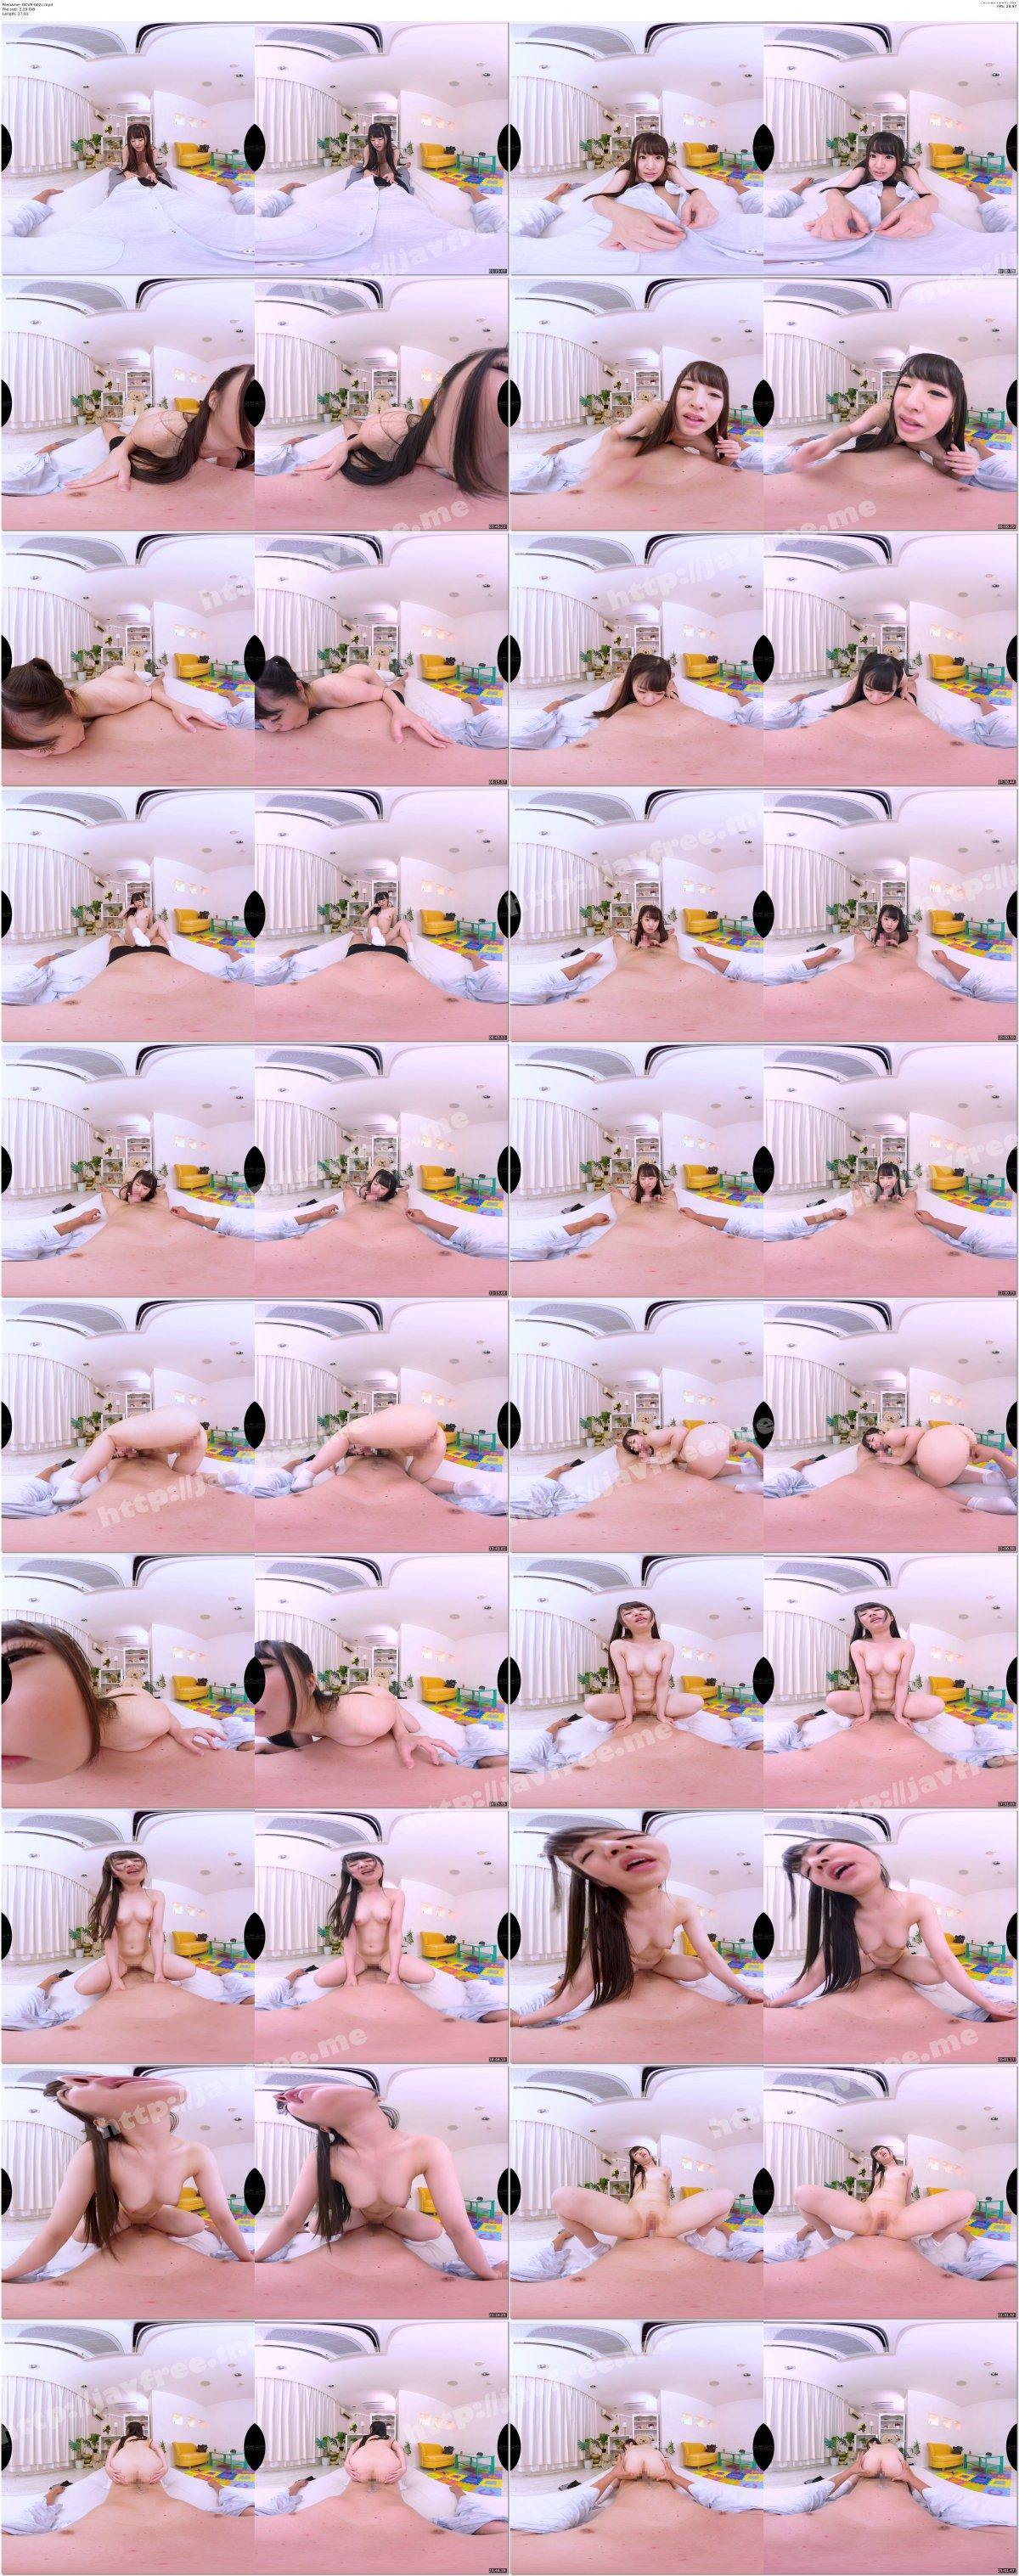 [OCVR-002] 【VR】3DVRからかい上手の可愛すぎる教え子に惚れ薬を飲ませたらアヘ顔全開イクイク!?大変なことになった件。桃尻かのん - image OCVR-002c on https://javfree.me